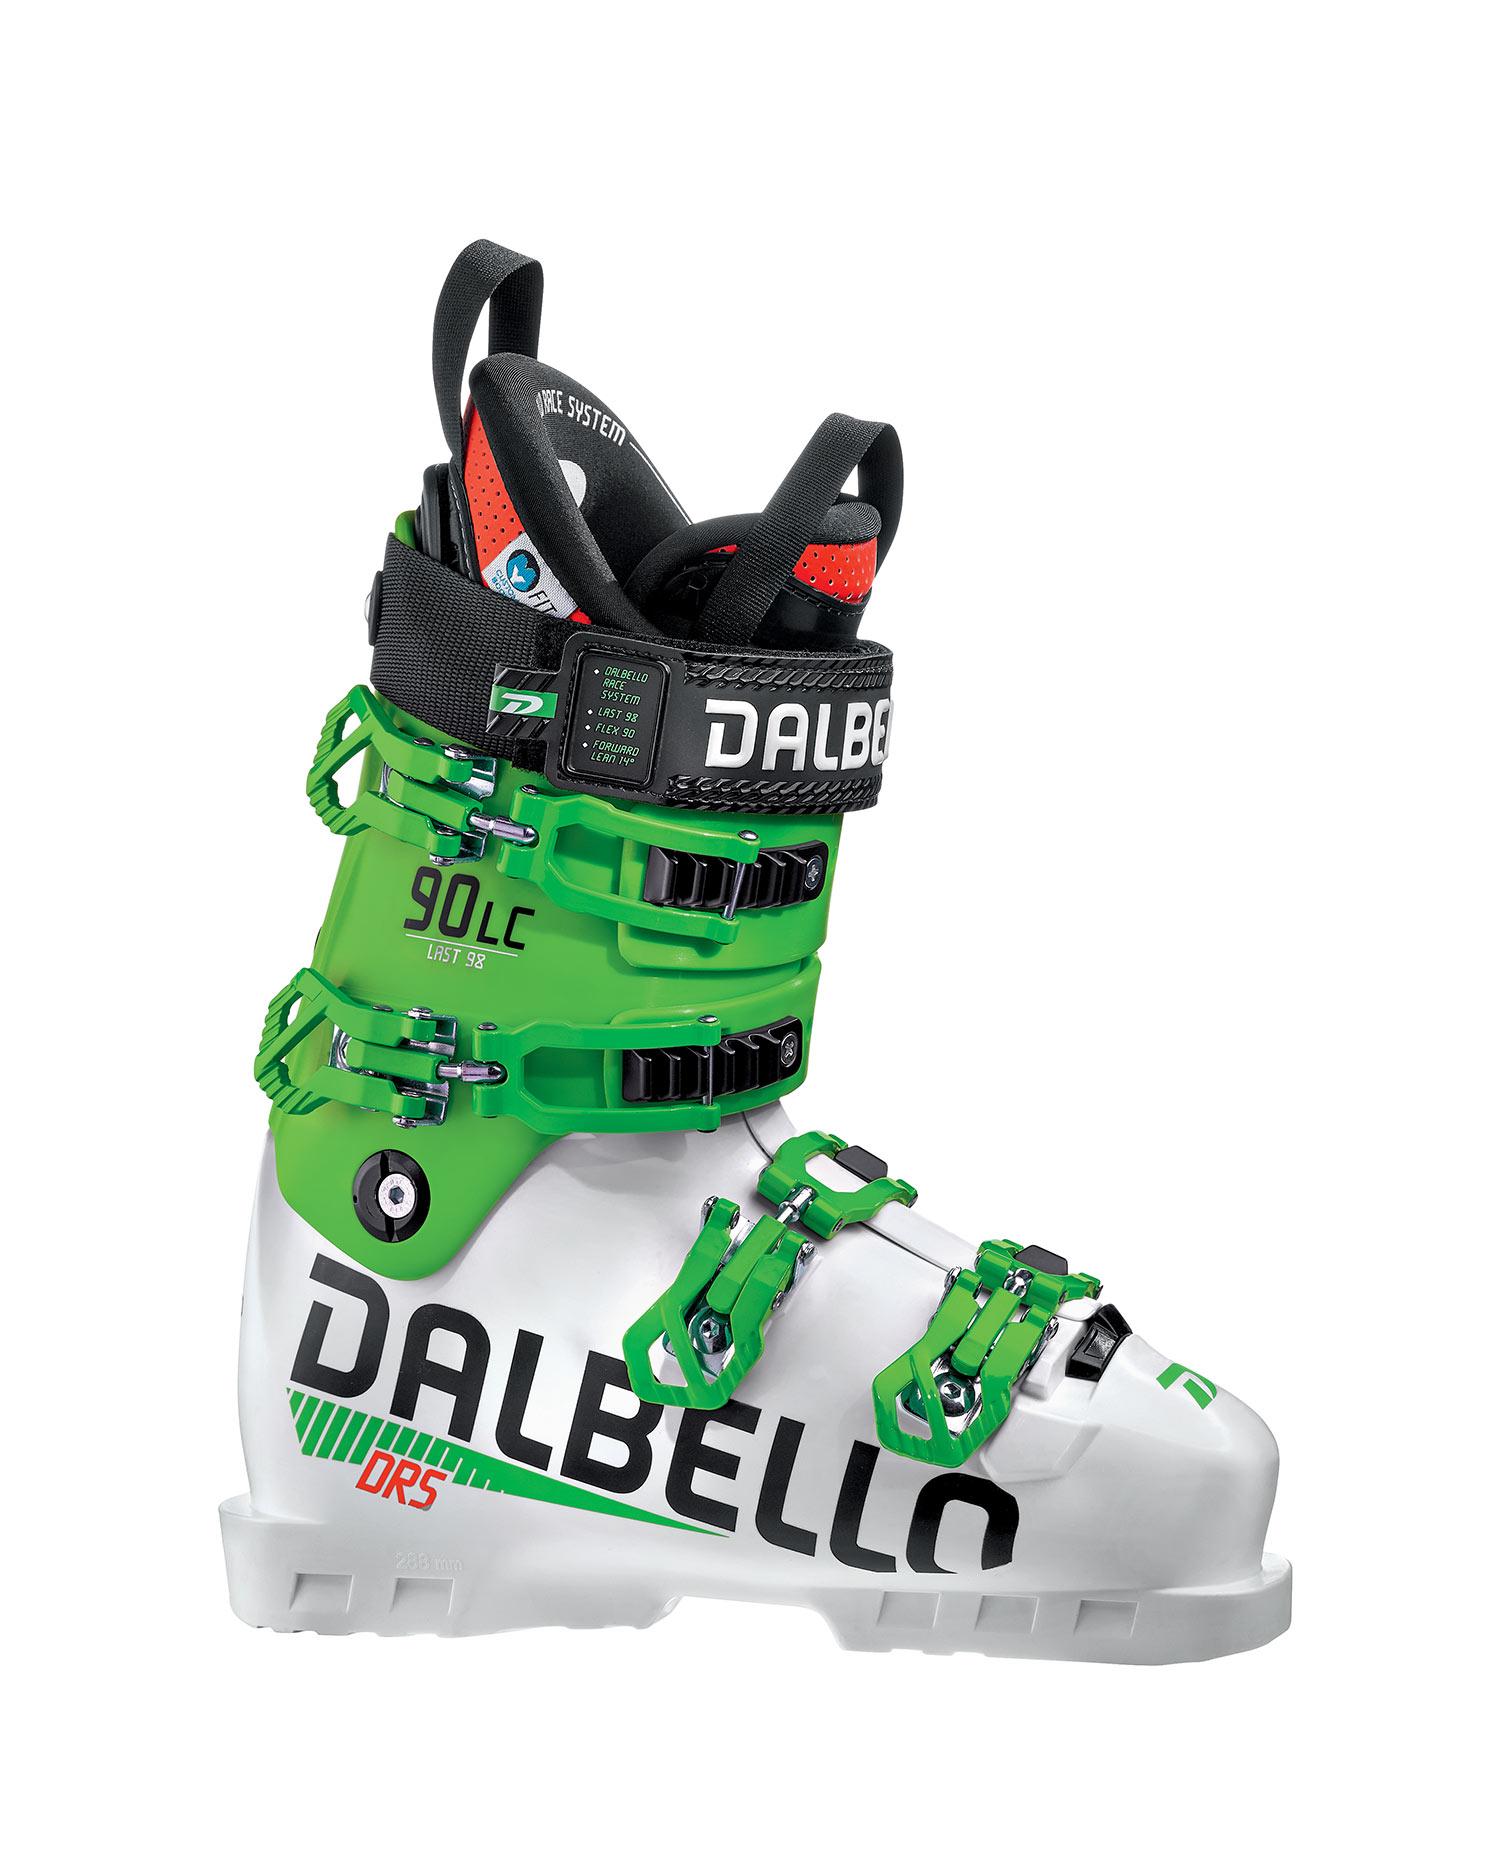 Lyžařské boty Dalbello DRS 90 LC UNISEX